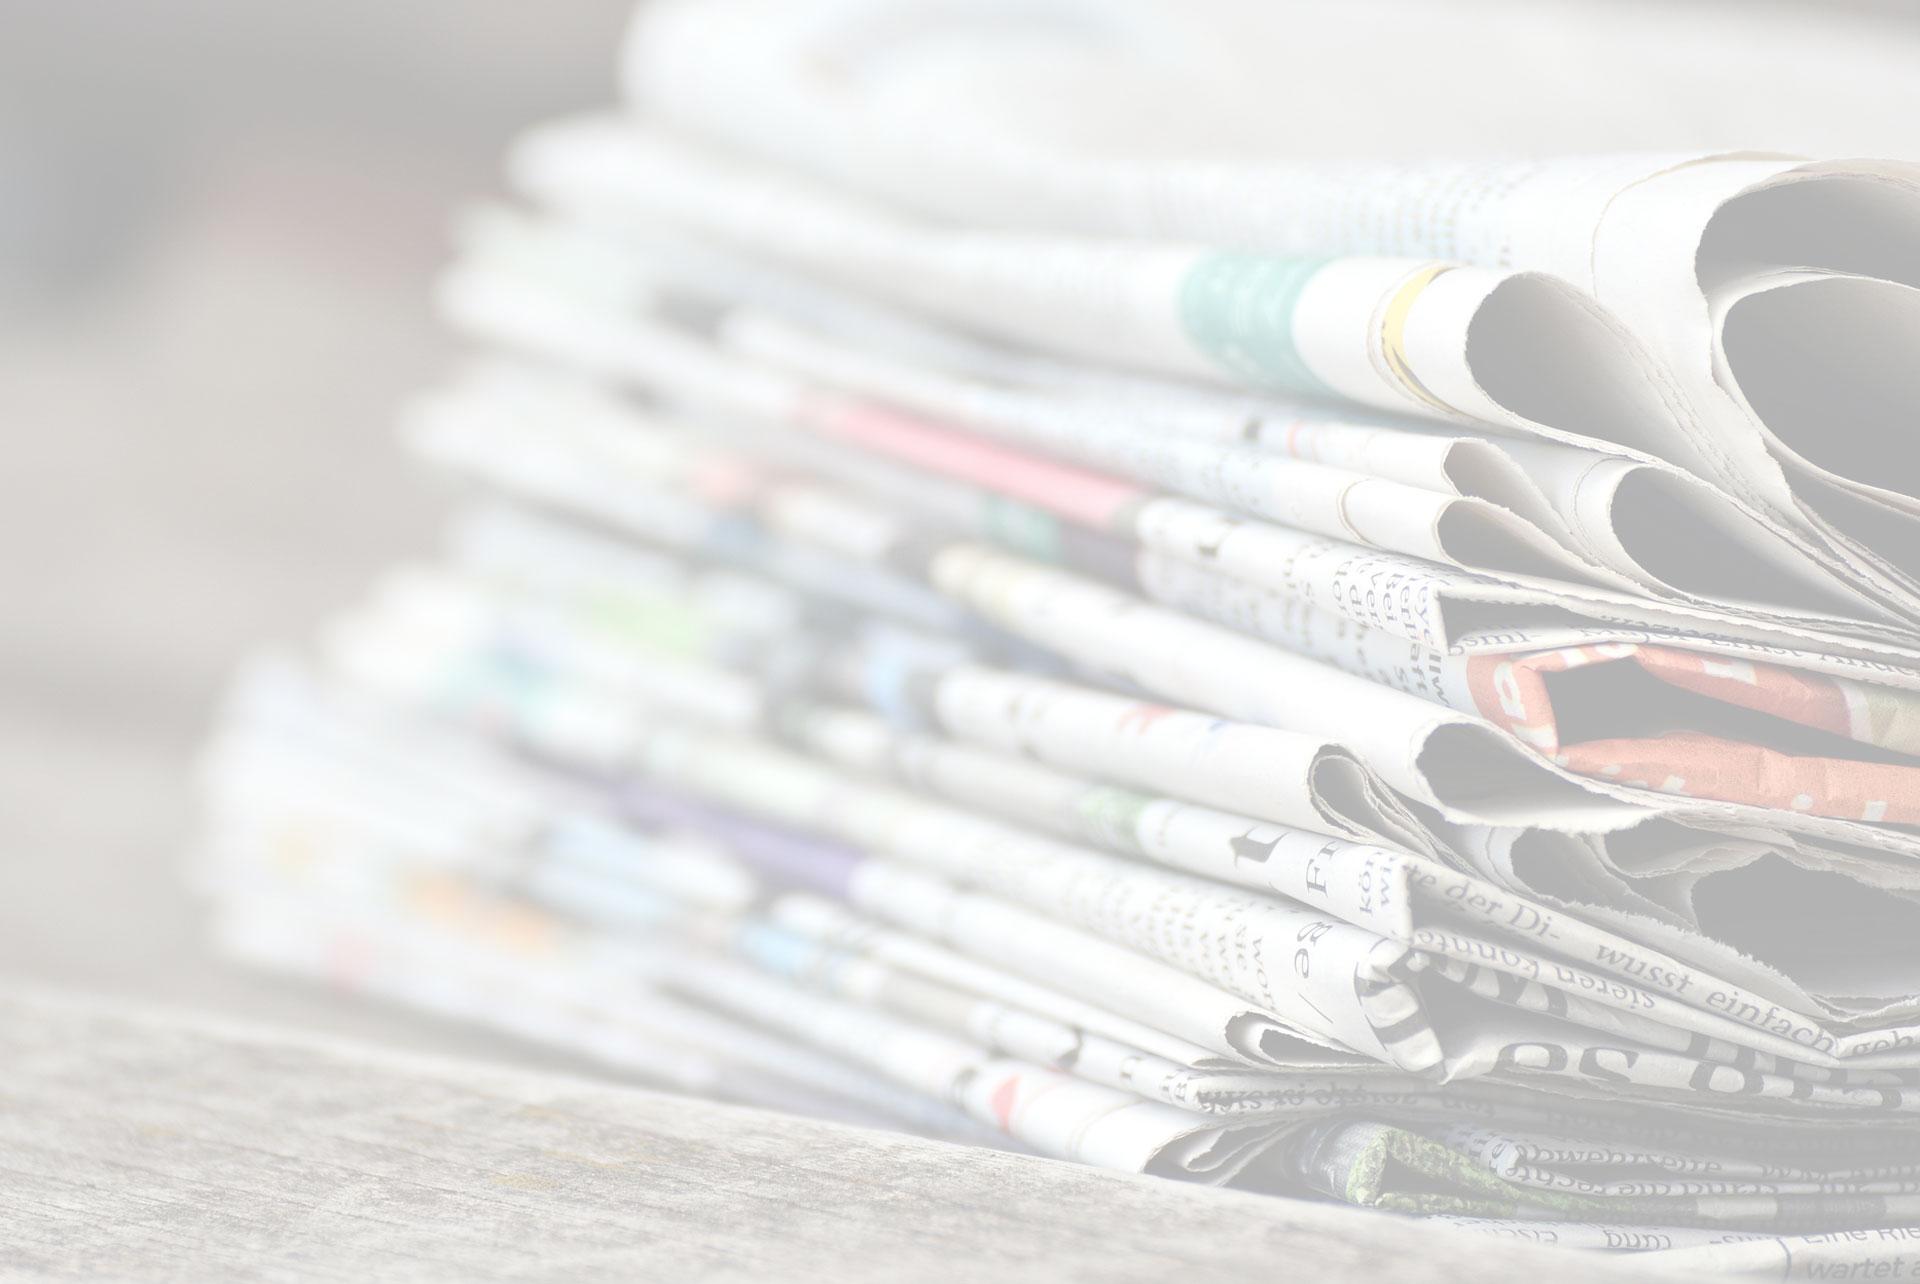 Giorgia Manghi